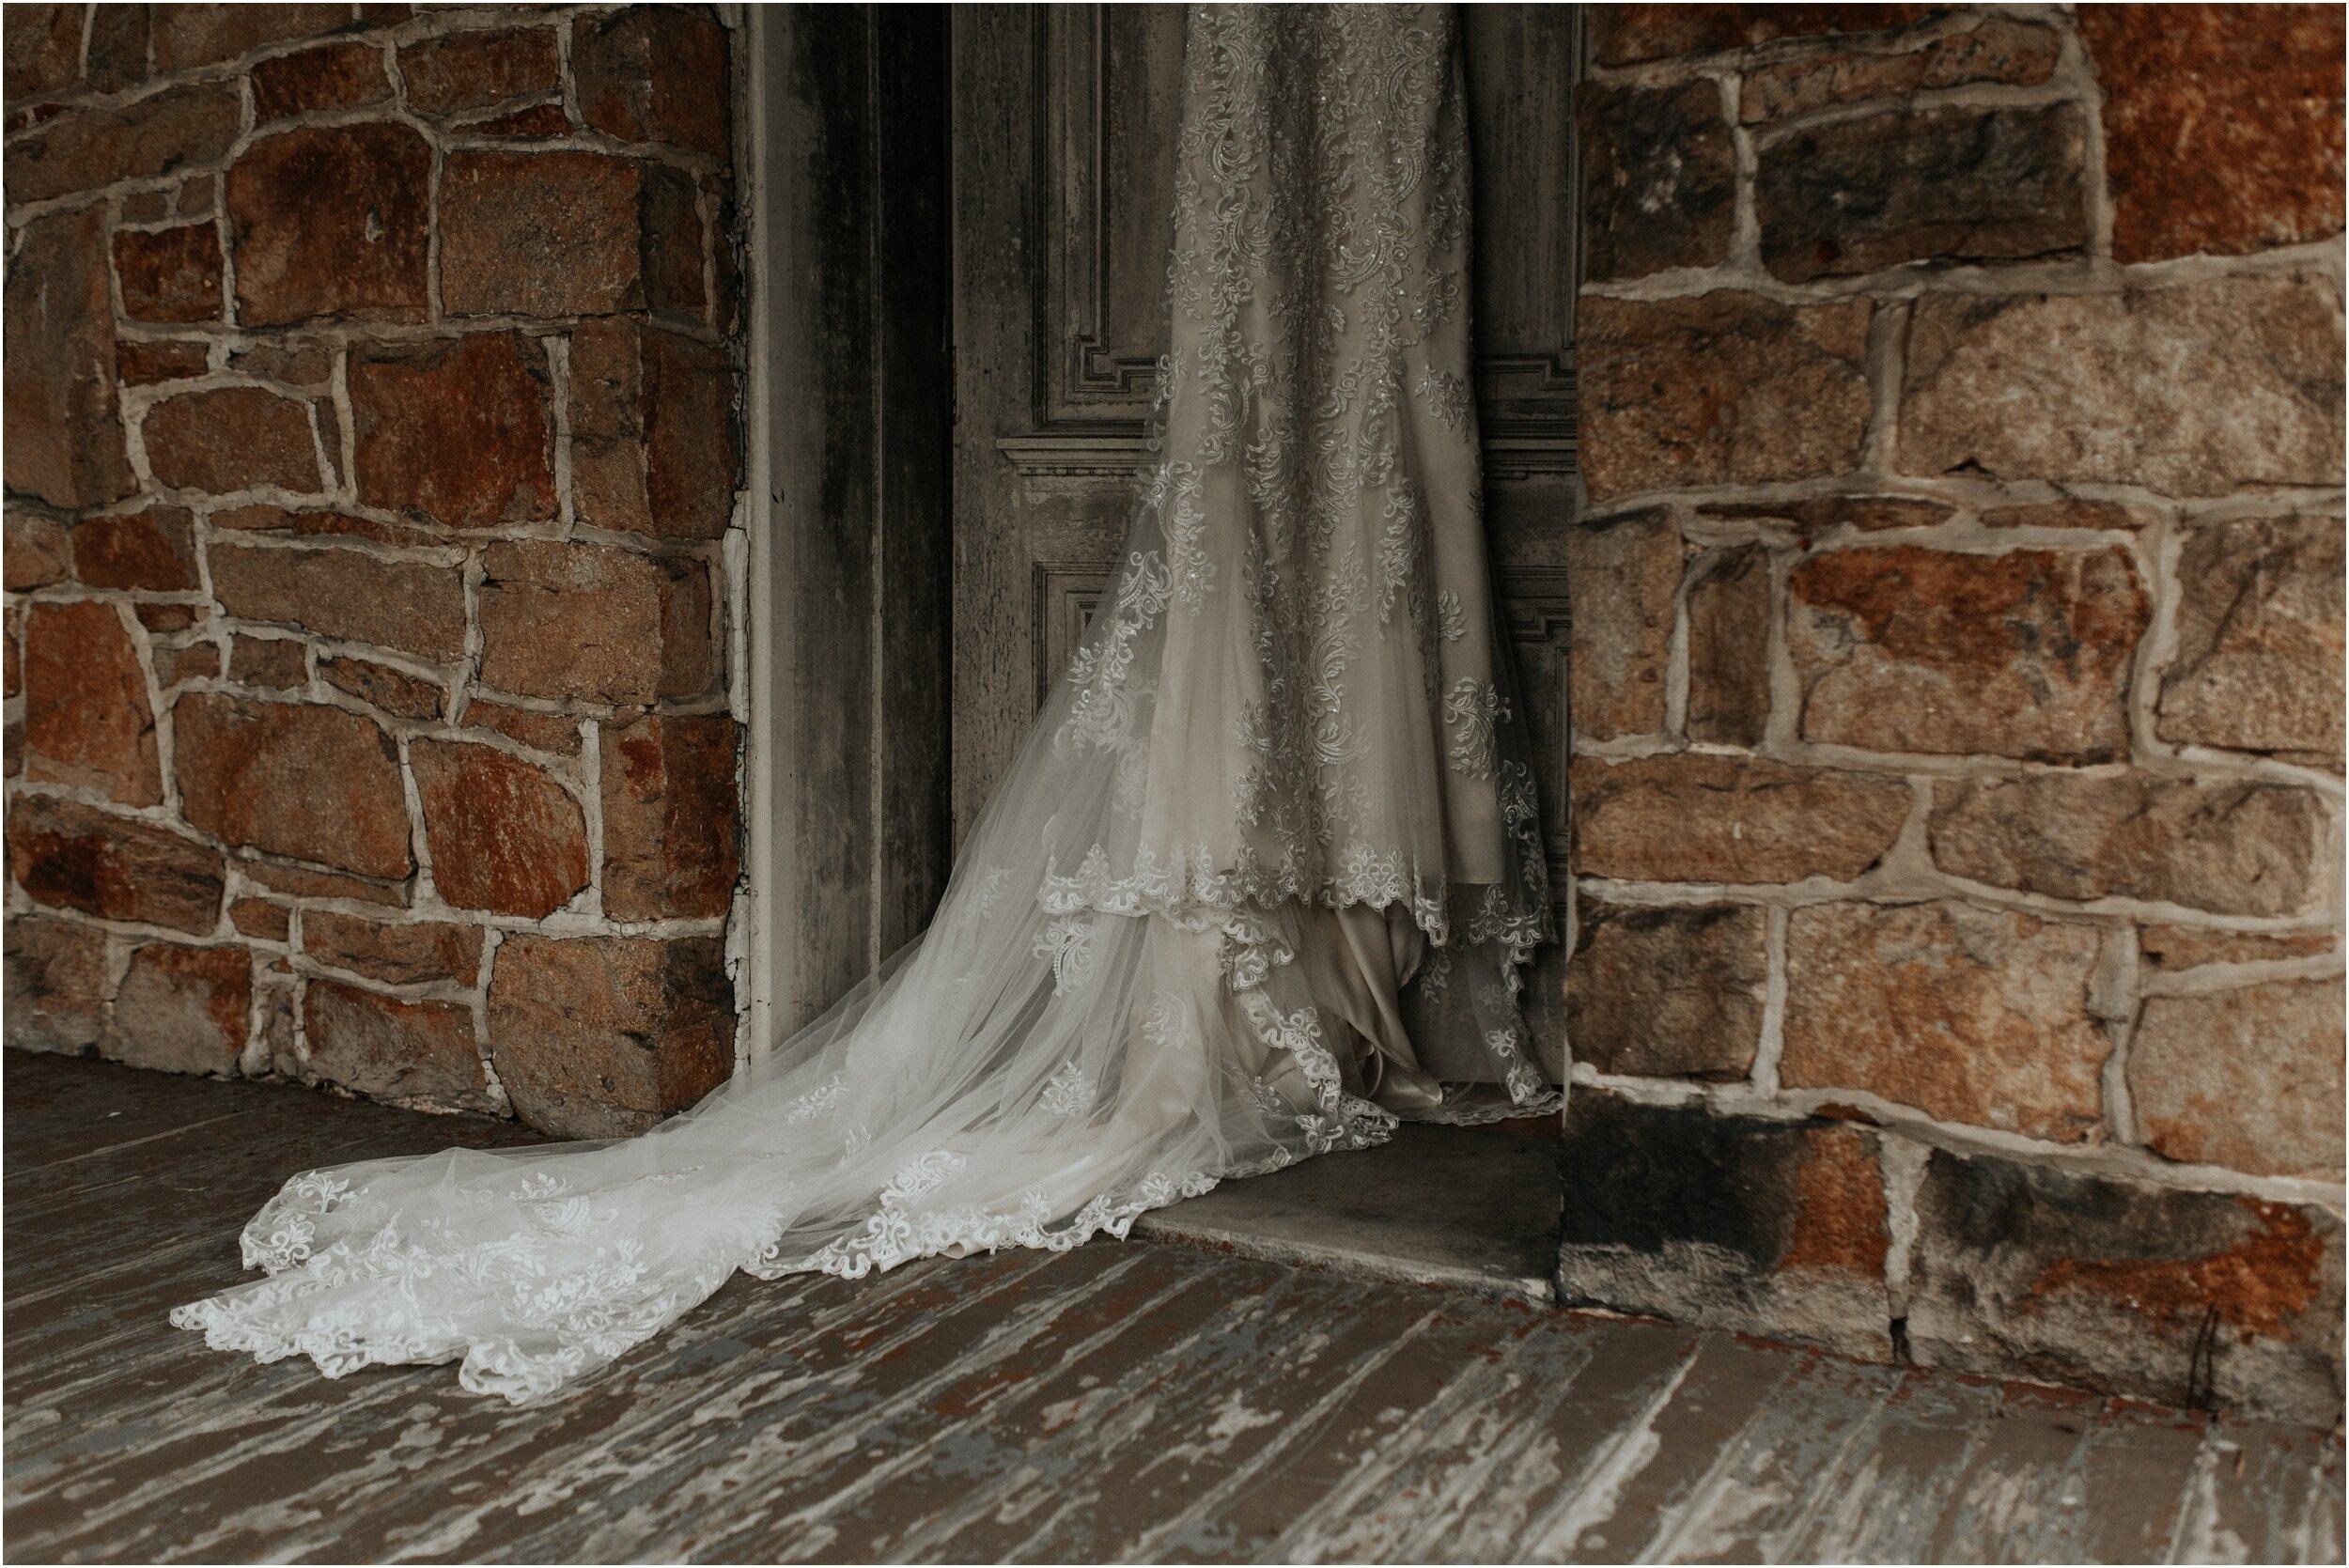 steph-and-jordan-cox-our-wedding-historic-shady-lane-compass-wedding-collective-hazel-lining-photography-destination-elopement-wedding-engagement-photography_0009.jpg